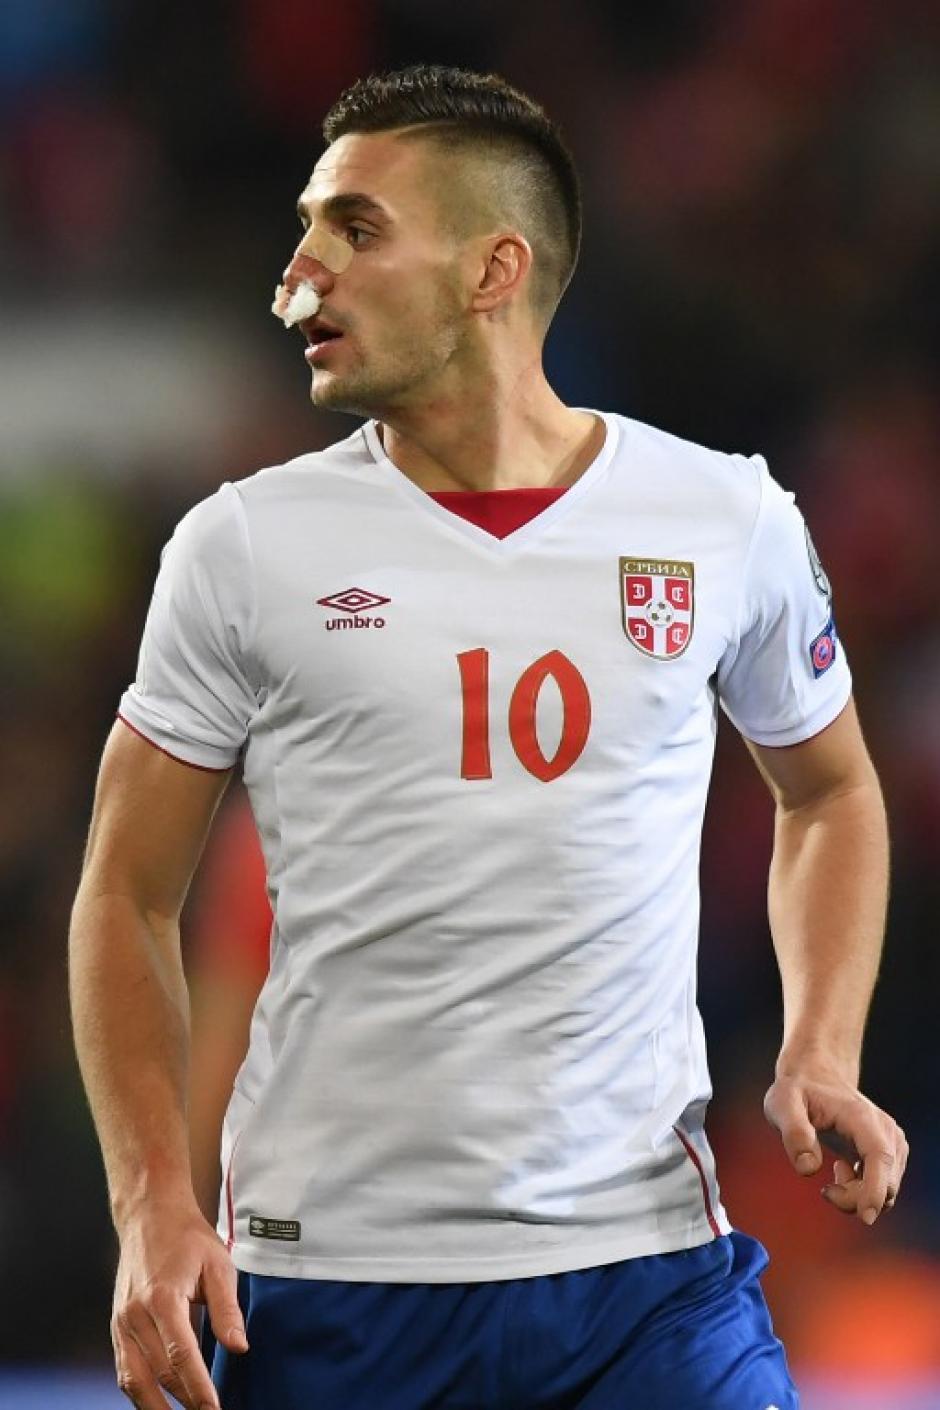 El jugador del Southampton pudo continuar en la cancha. (Foto: AFP)